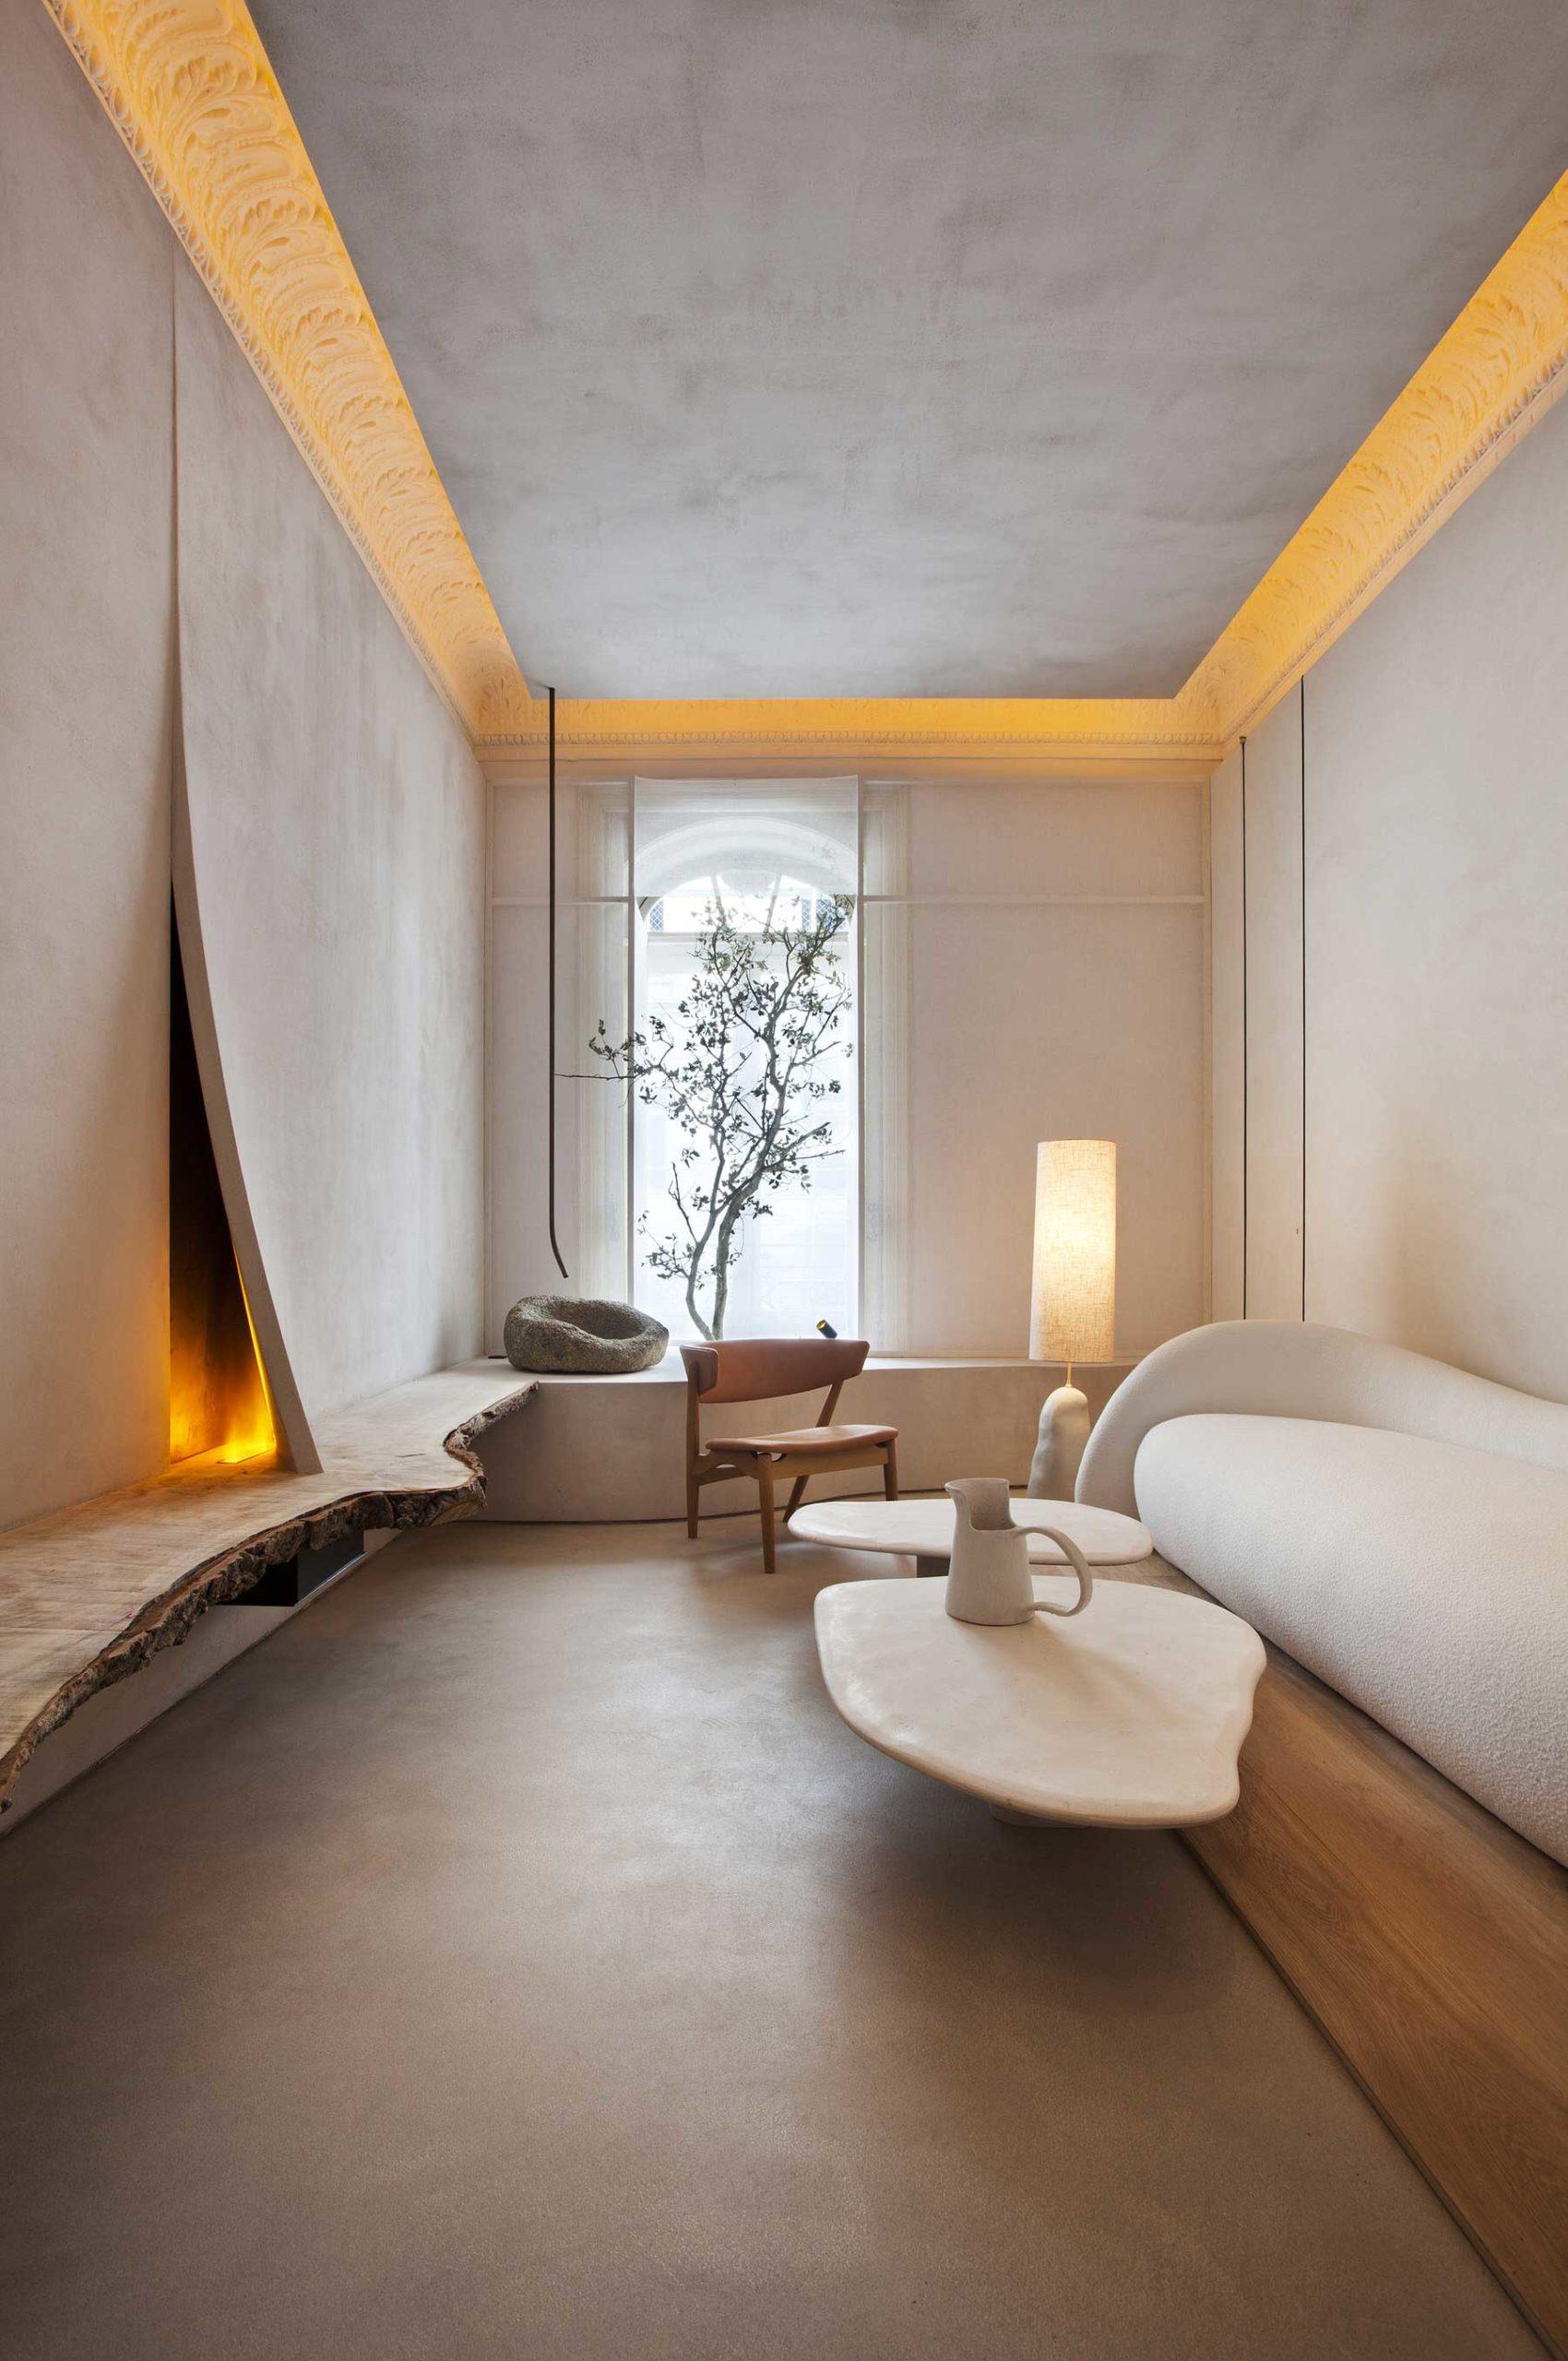 Casa Decor 2020, Wabi Sabi Residential Installation by Lorna De Santos, Photo Nacho Uribe Salazar | Yellowtrace